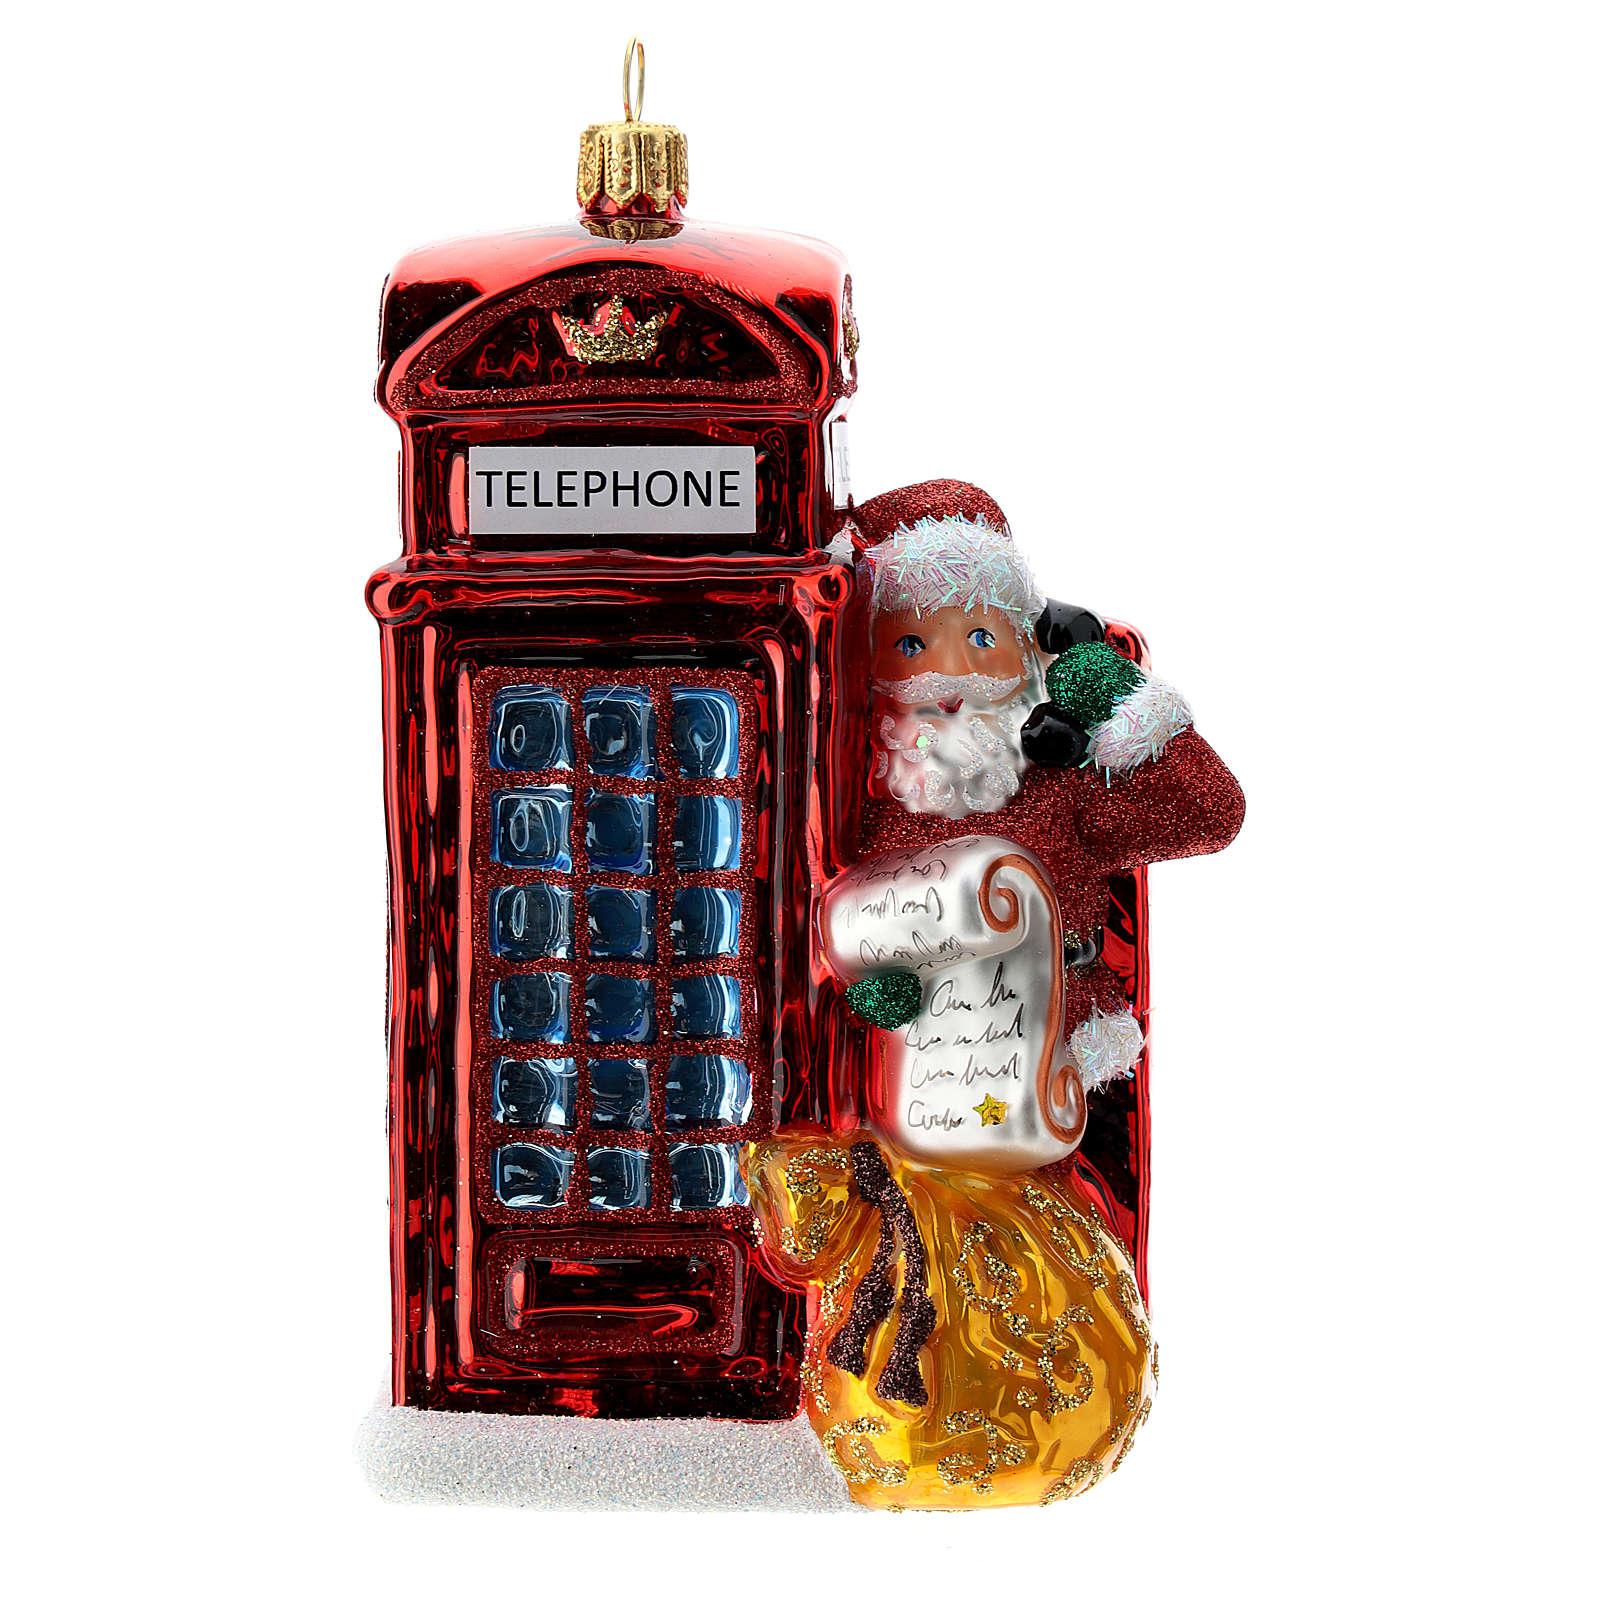 Papá Noel cabina telefónica londinesa adorno vidrio soplado 4